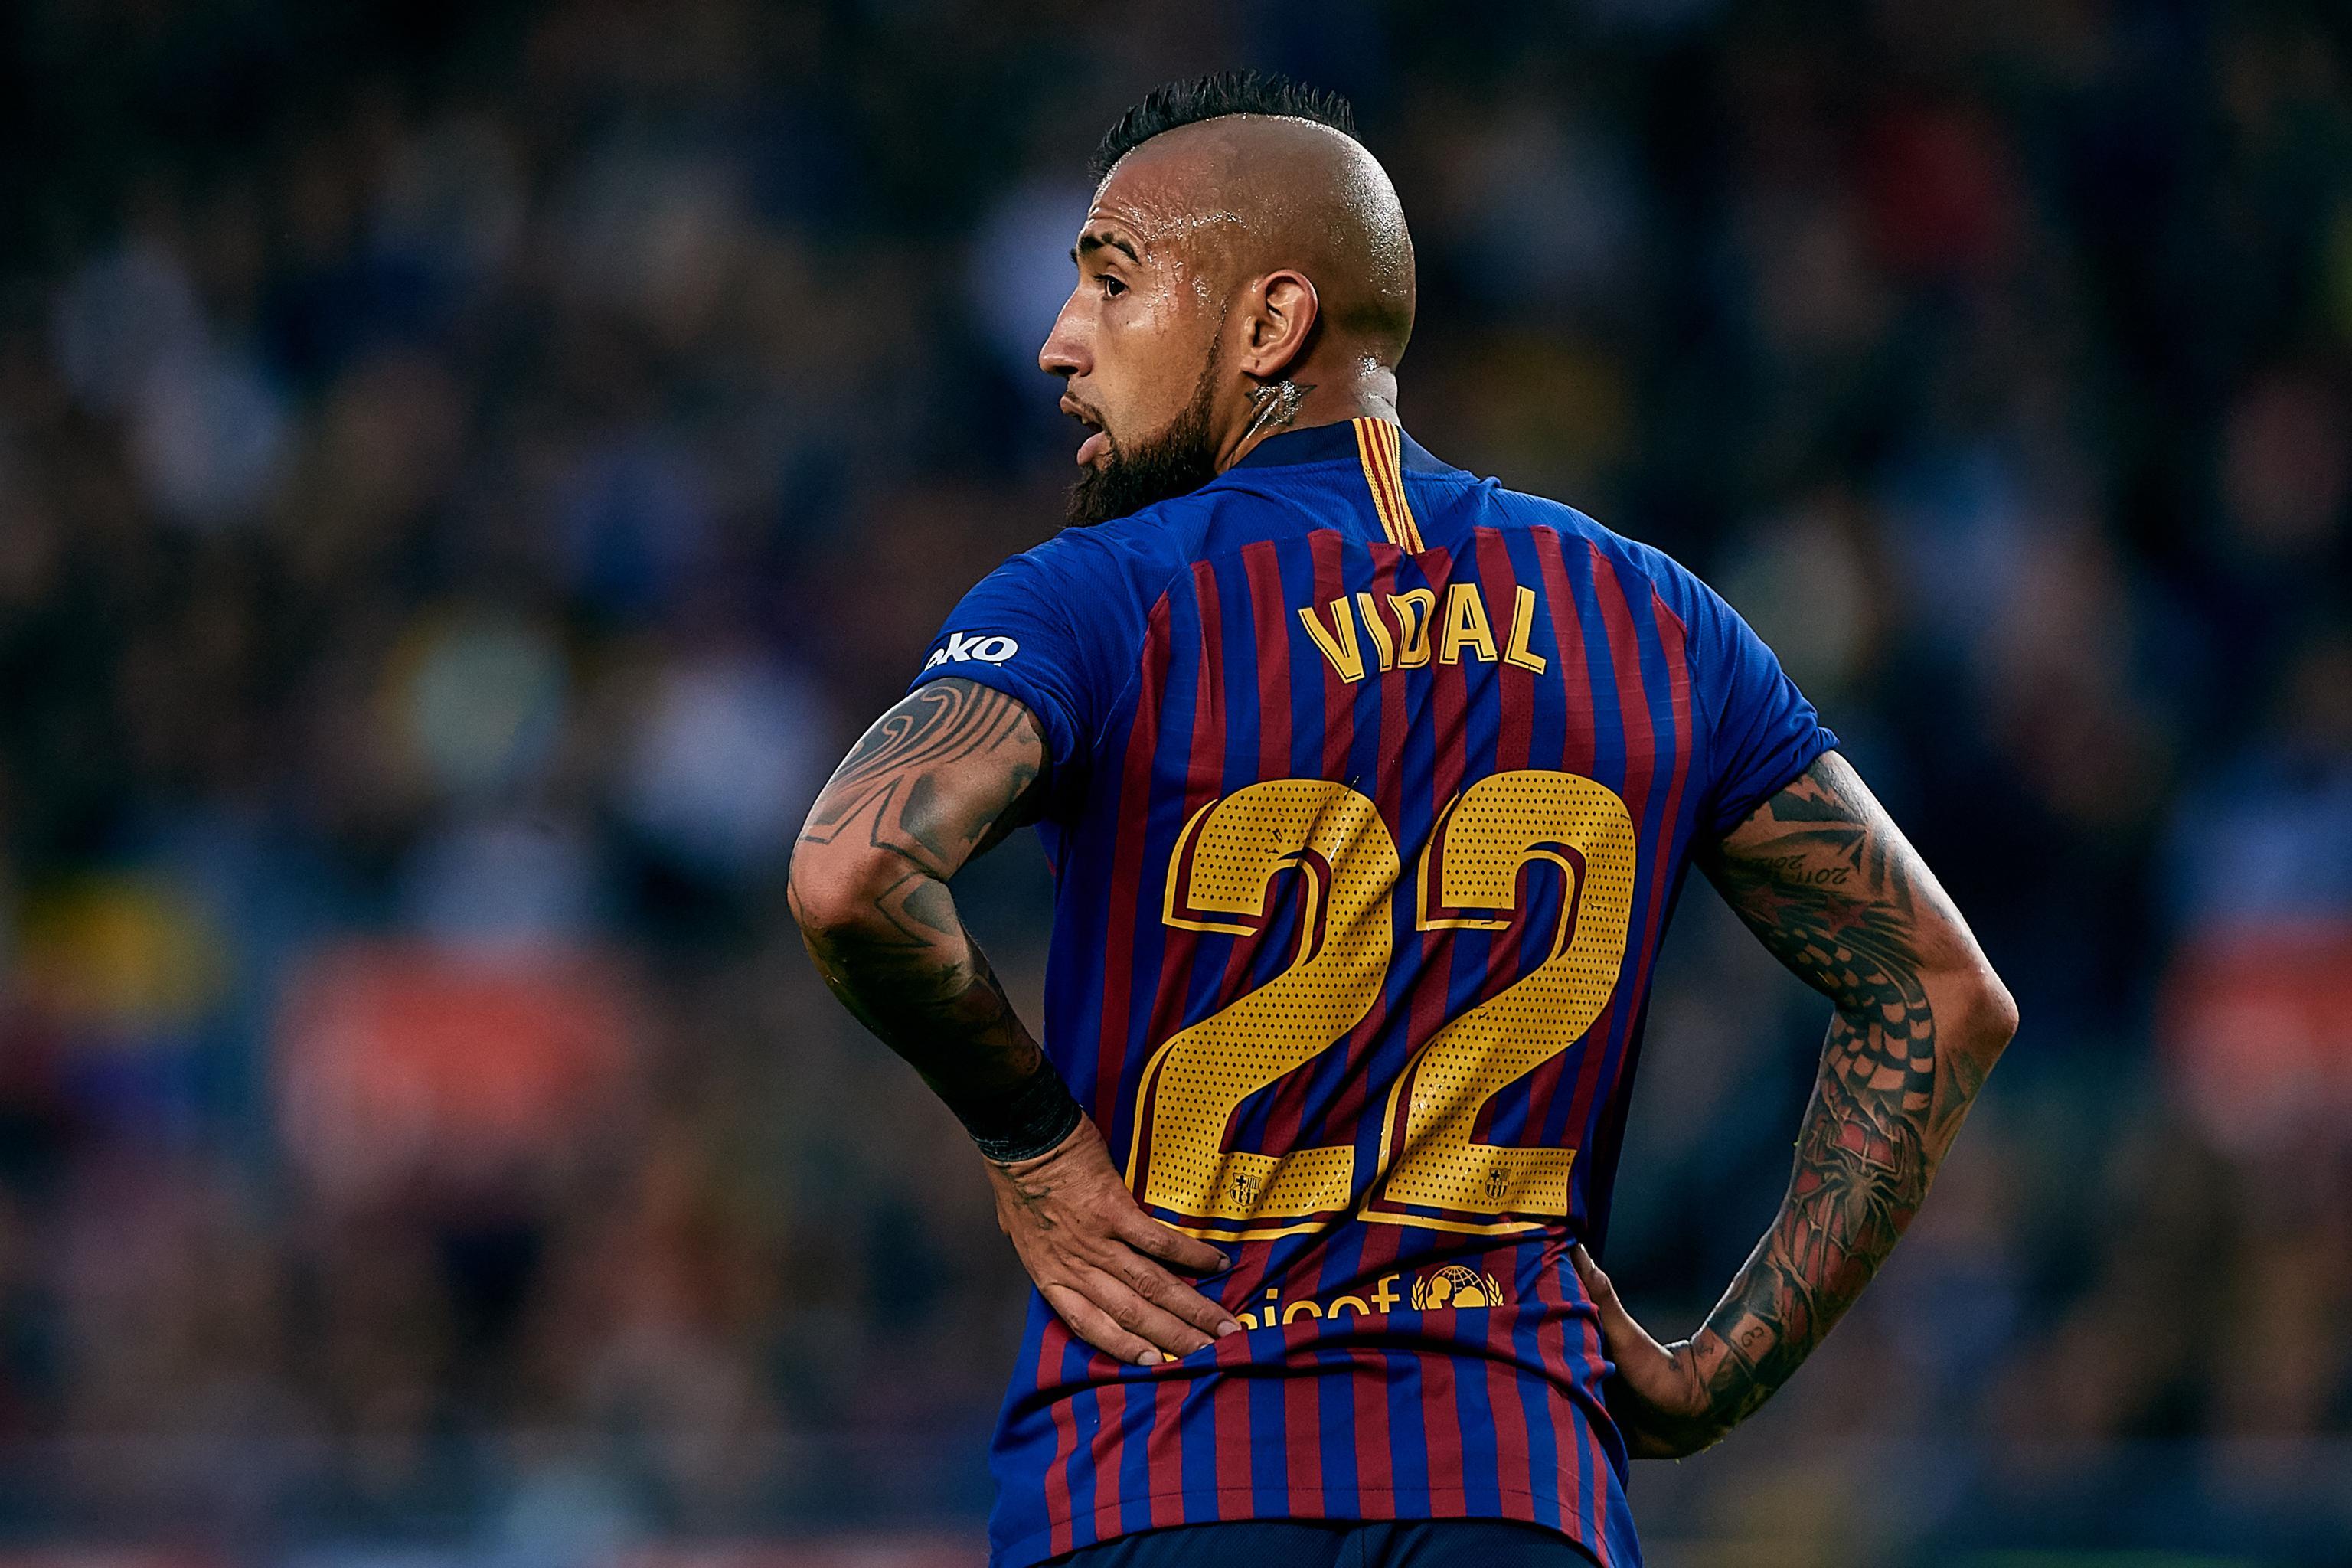 Report Juventus Considering Transfer For Barcelona Midfielder Arturo Vidal Bleacher Report Latest News Videos And Highlights